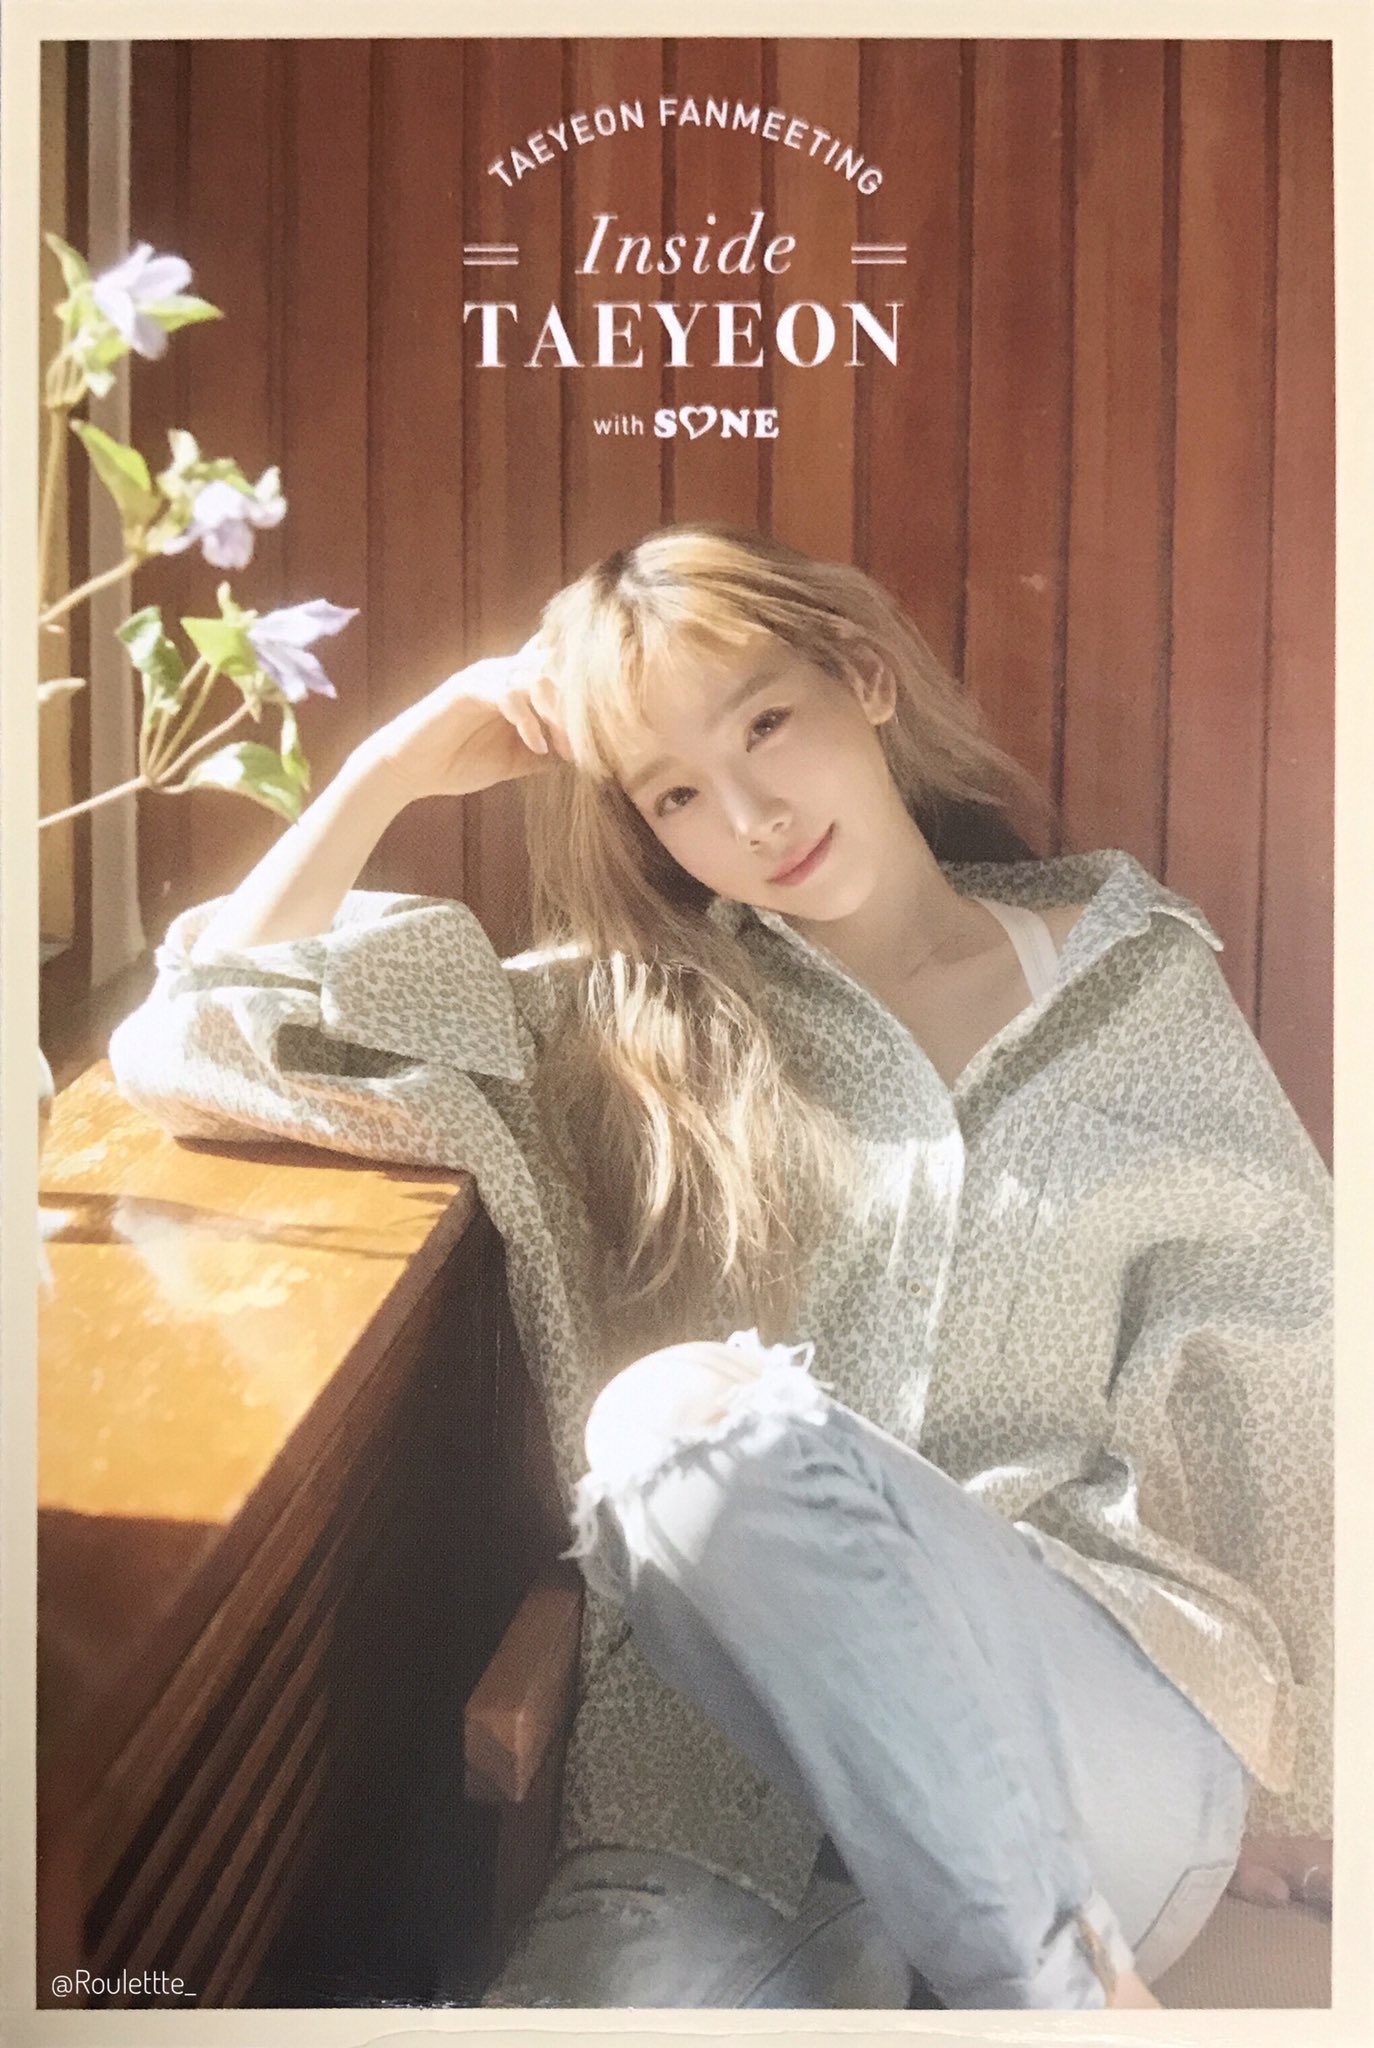 191123 TAEYEON FAN MEETING 'Inside - TAEYEON with SONE' 明信片扫